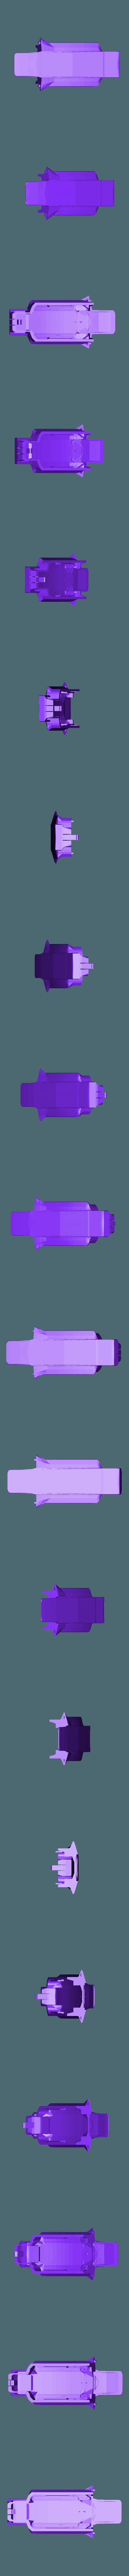 cover_a.stl Download free STL file Foldable drone frame (Mavic look like, body & head alternative) Remix • 3D printer model, mwilmars